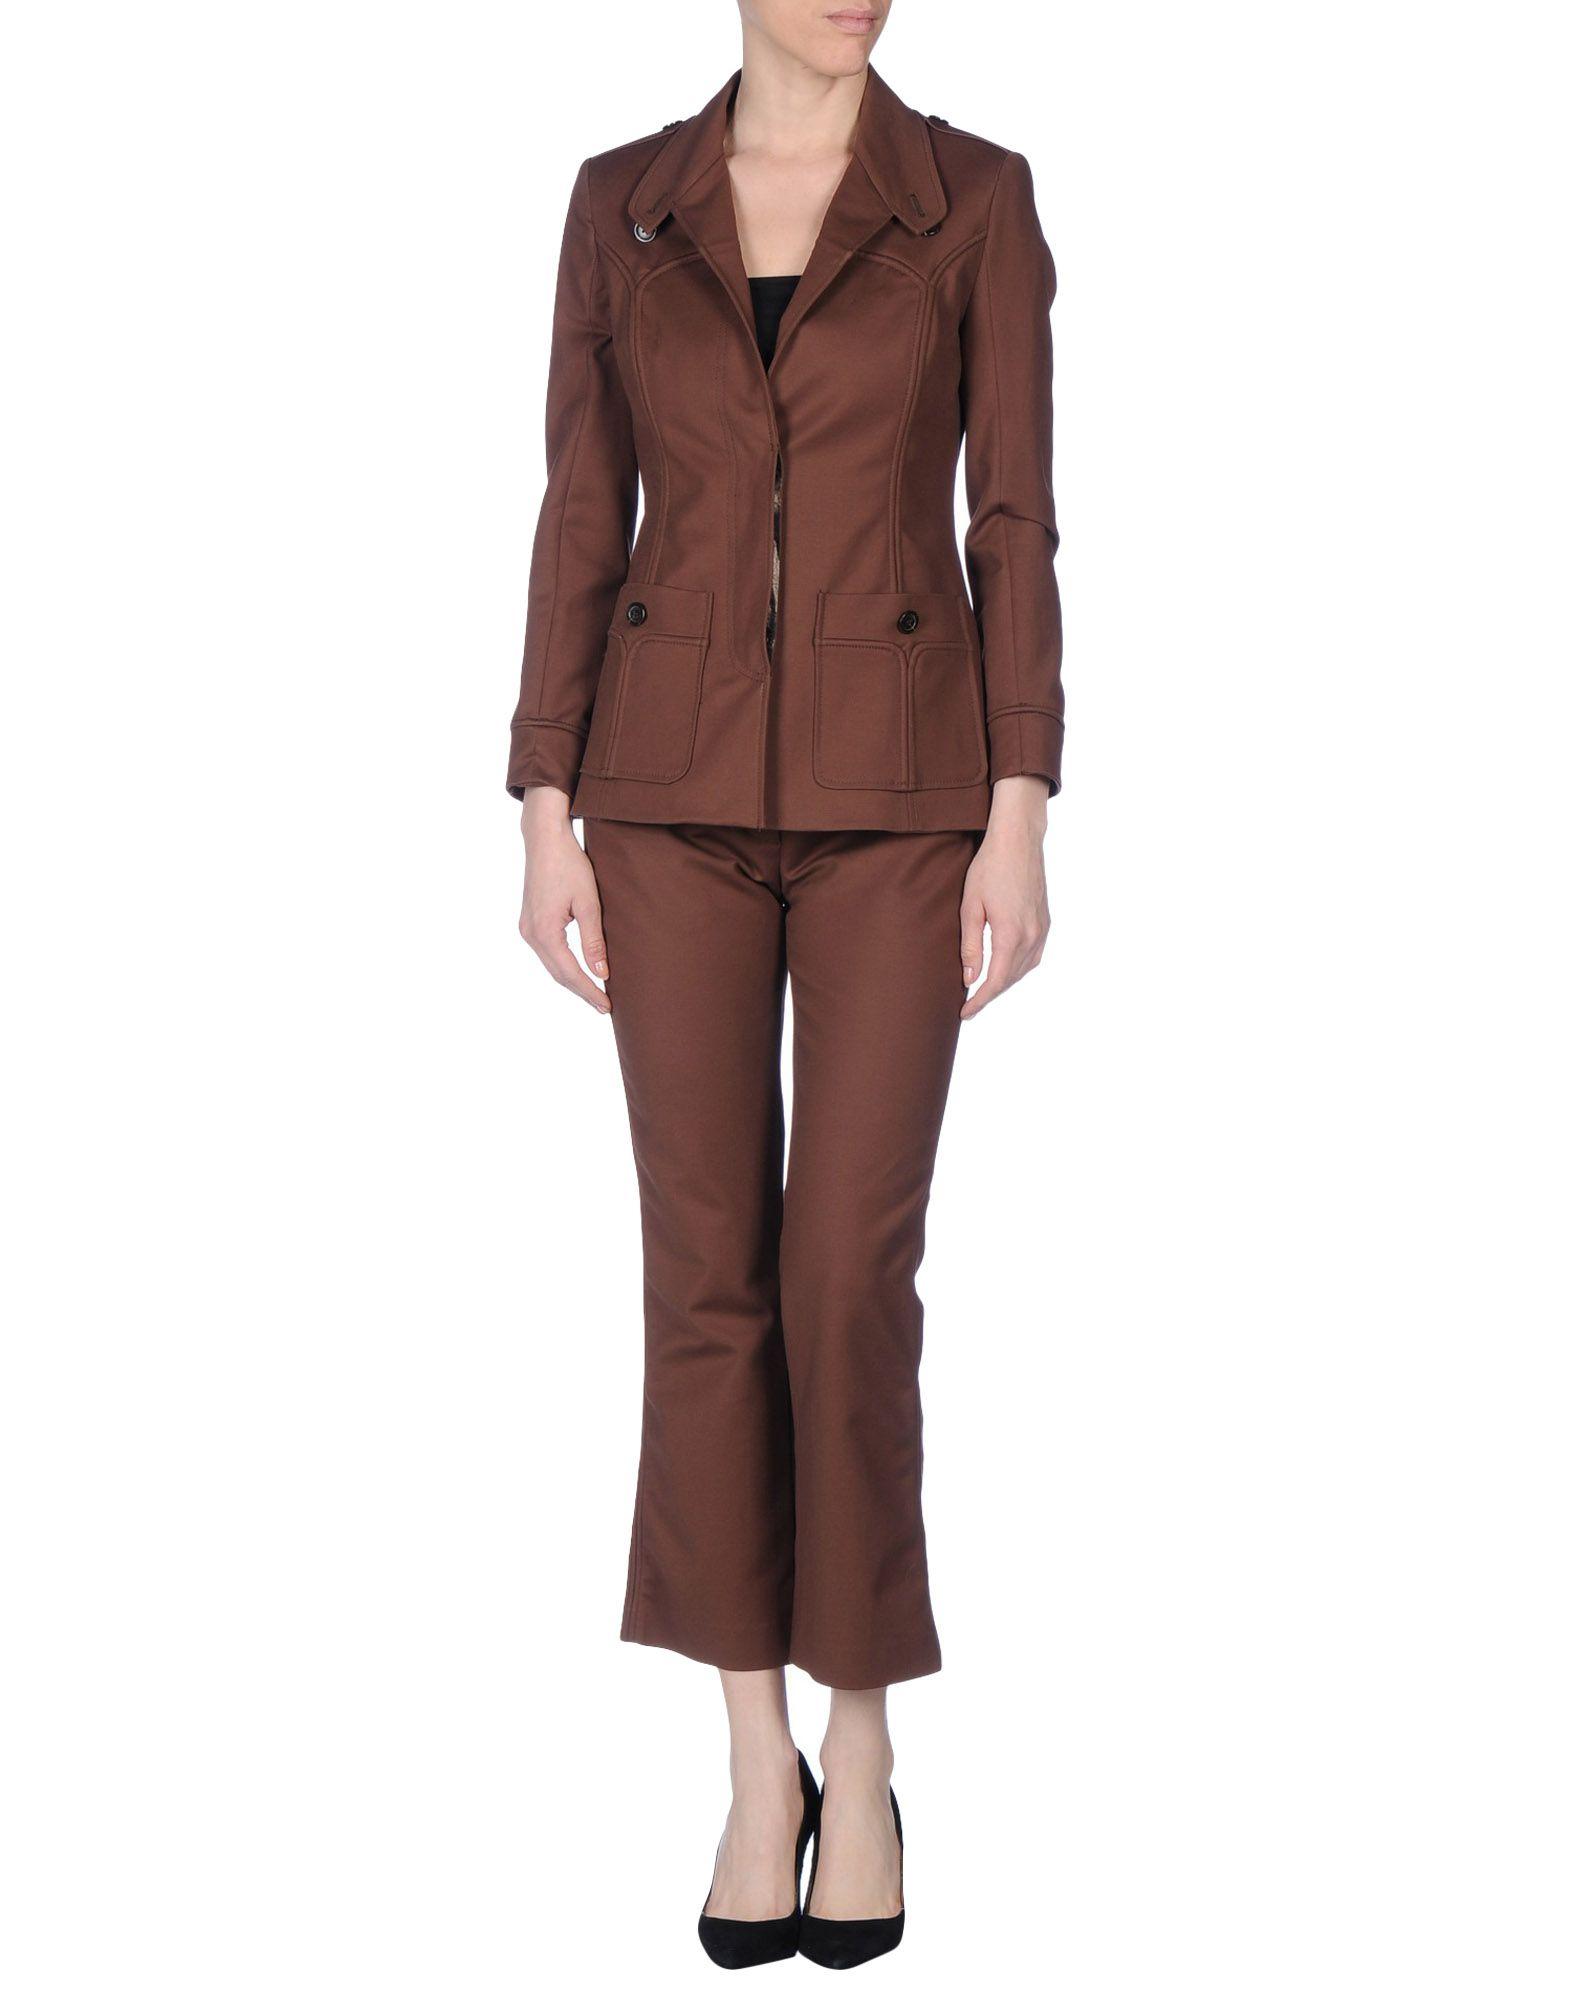 Just cavalli Women's Suit in Brown | Lyst